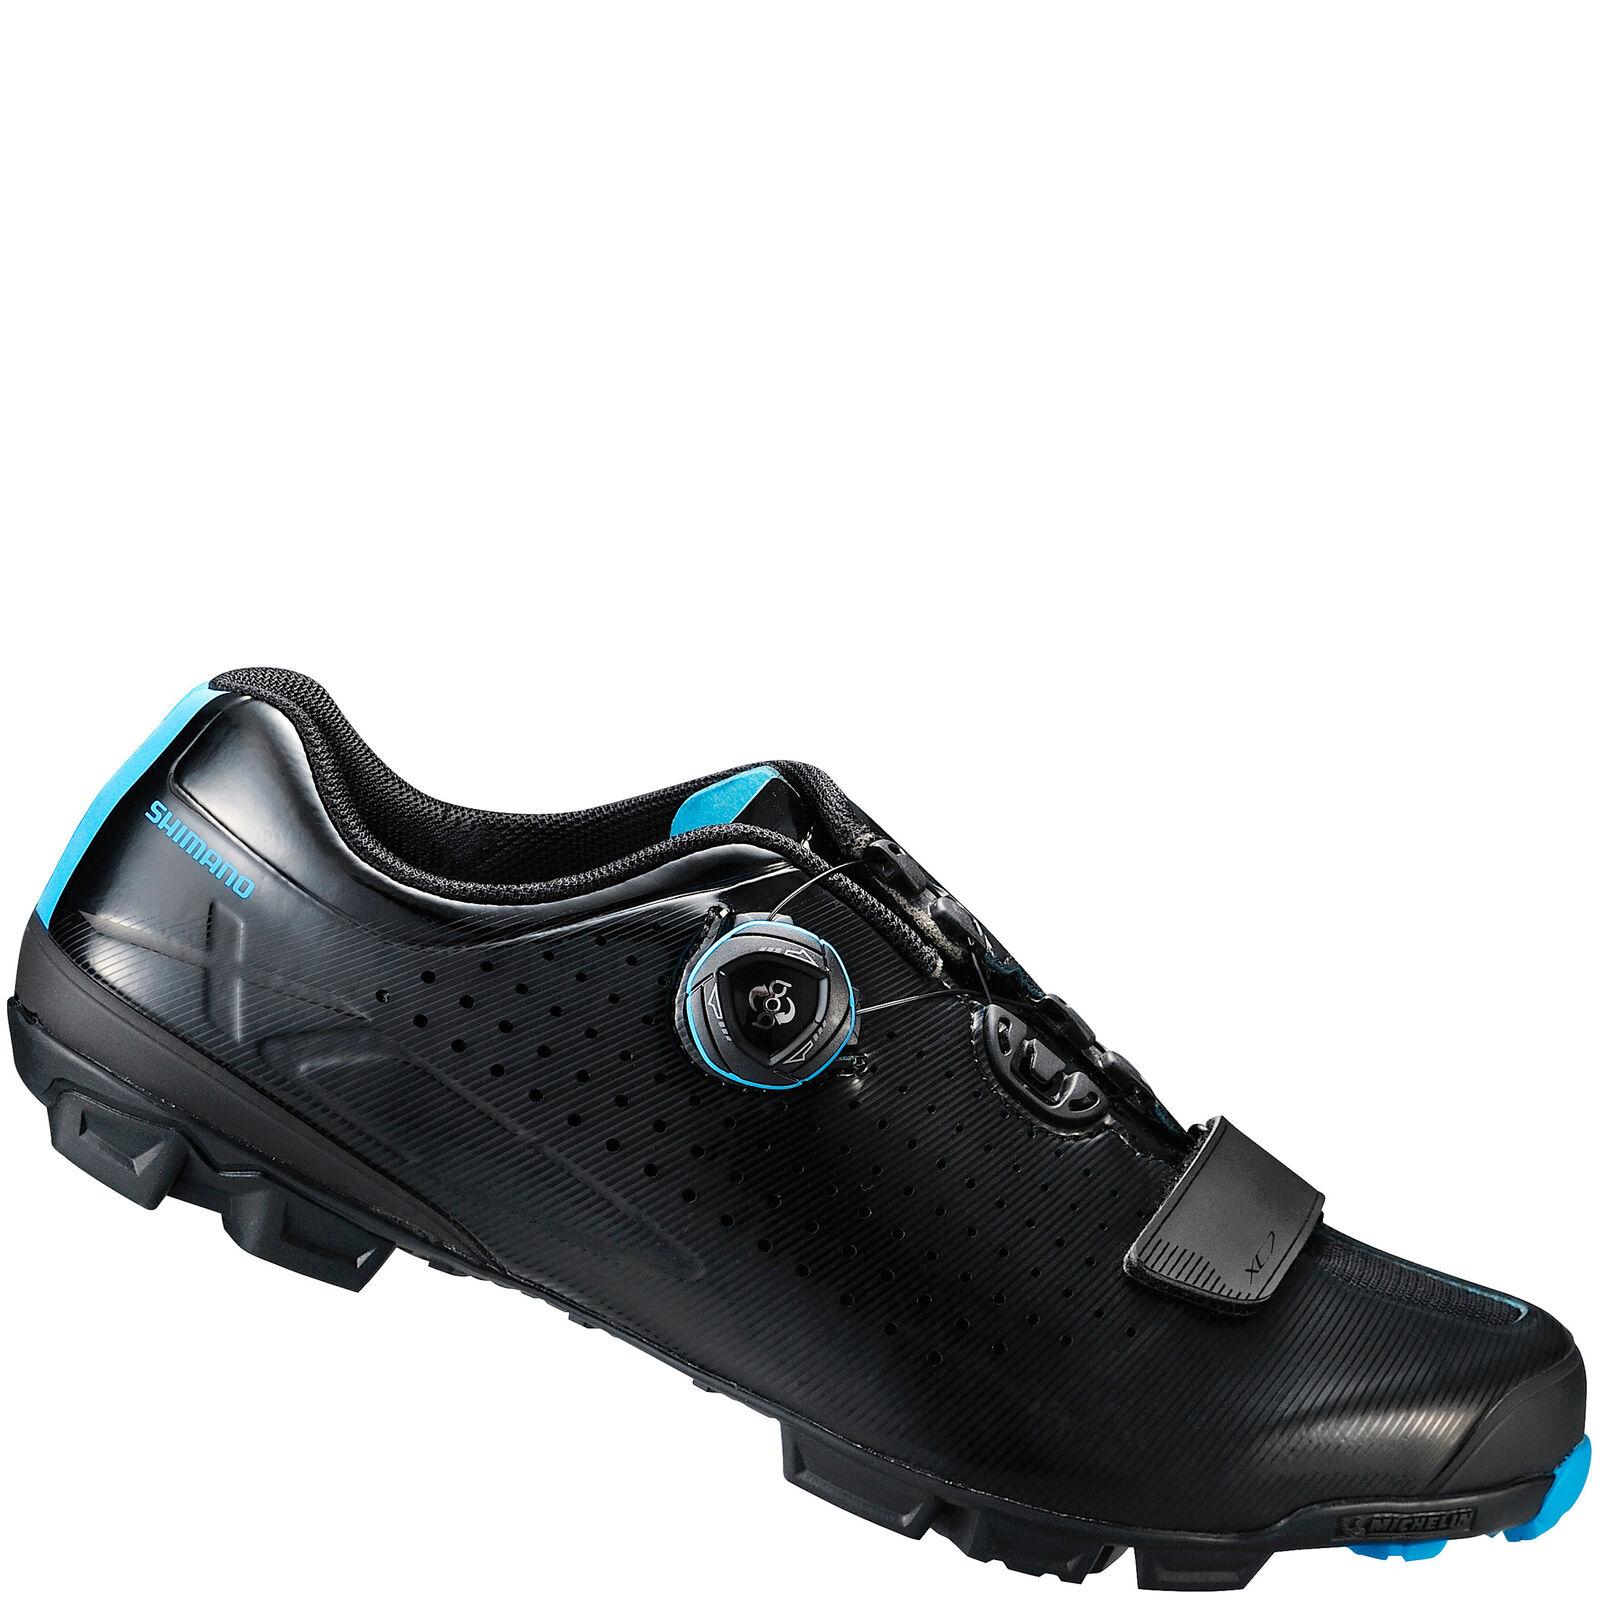 Shimano XC7 SPD MTB Cycling Shoes - Black - EU 41 - Black